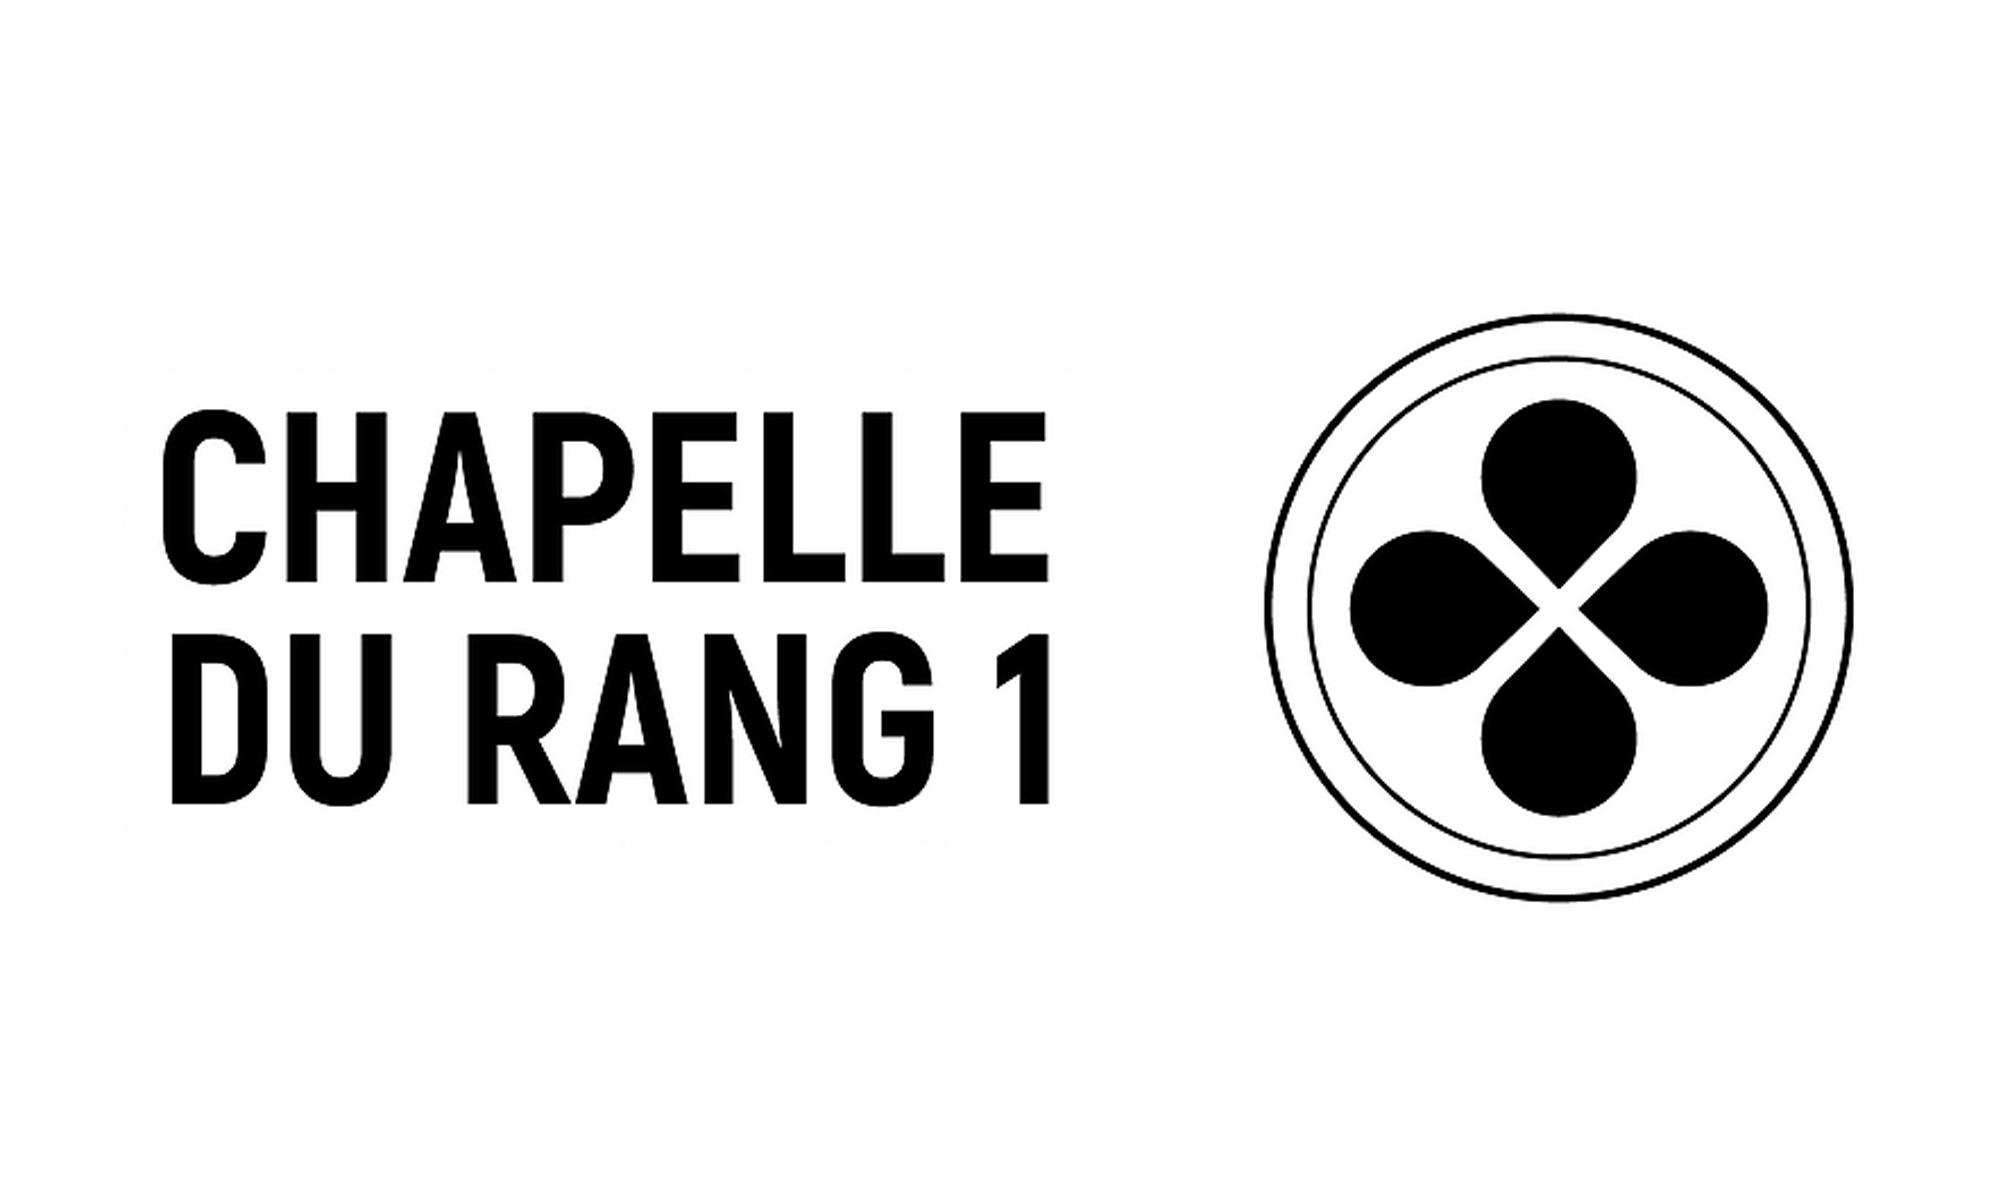 Chappelle rang1